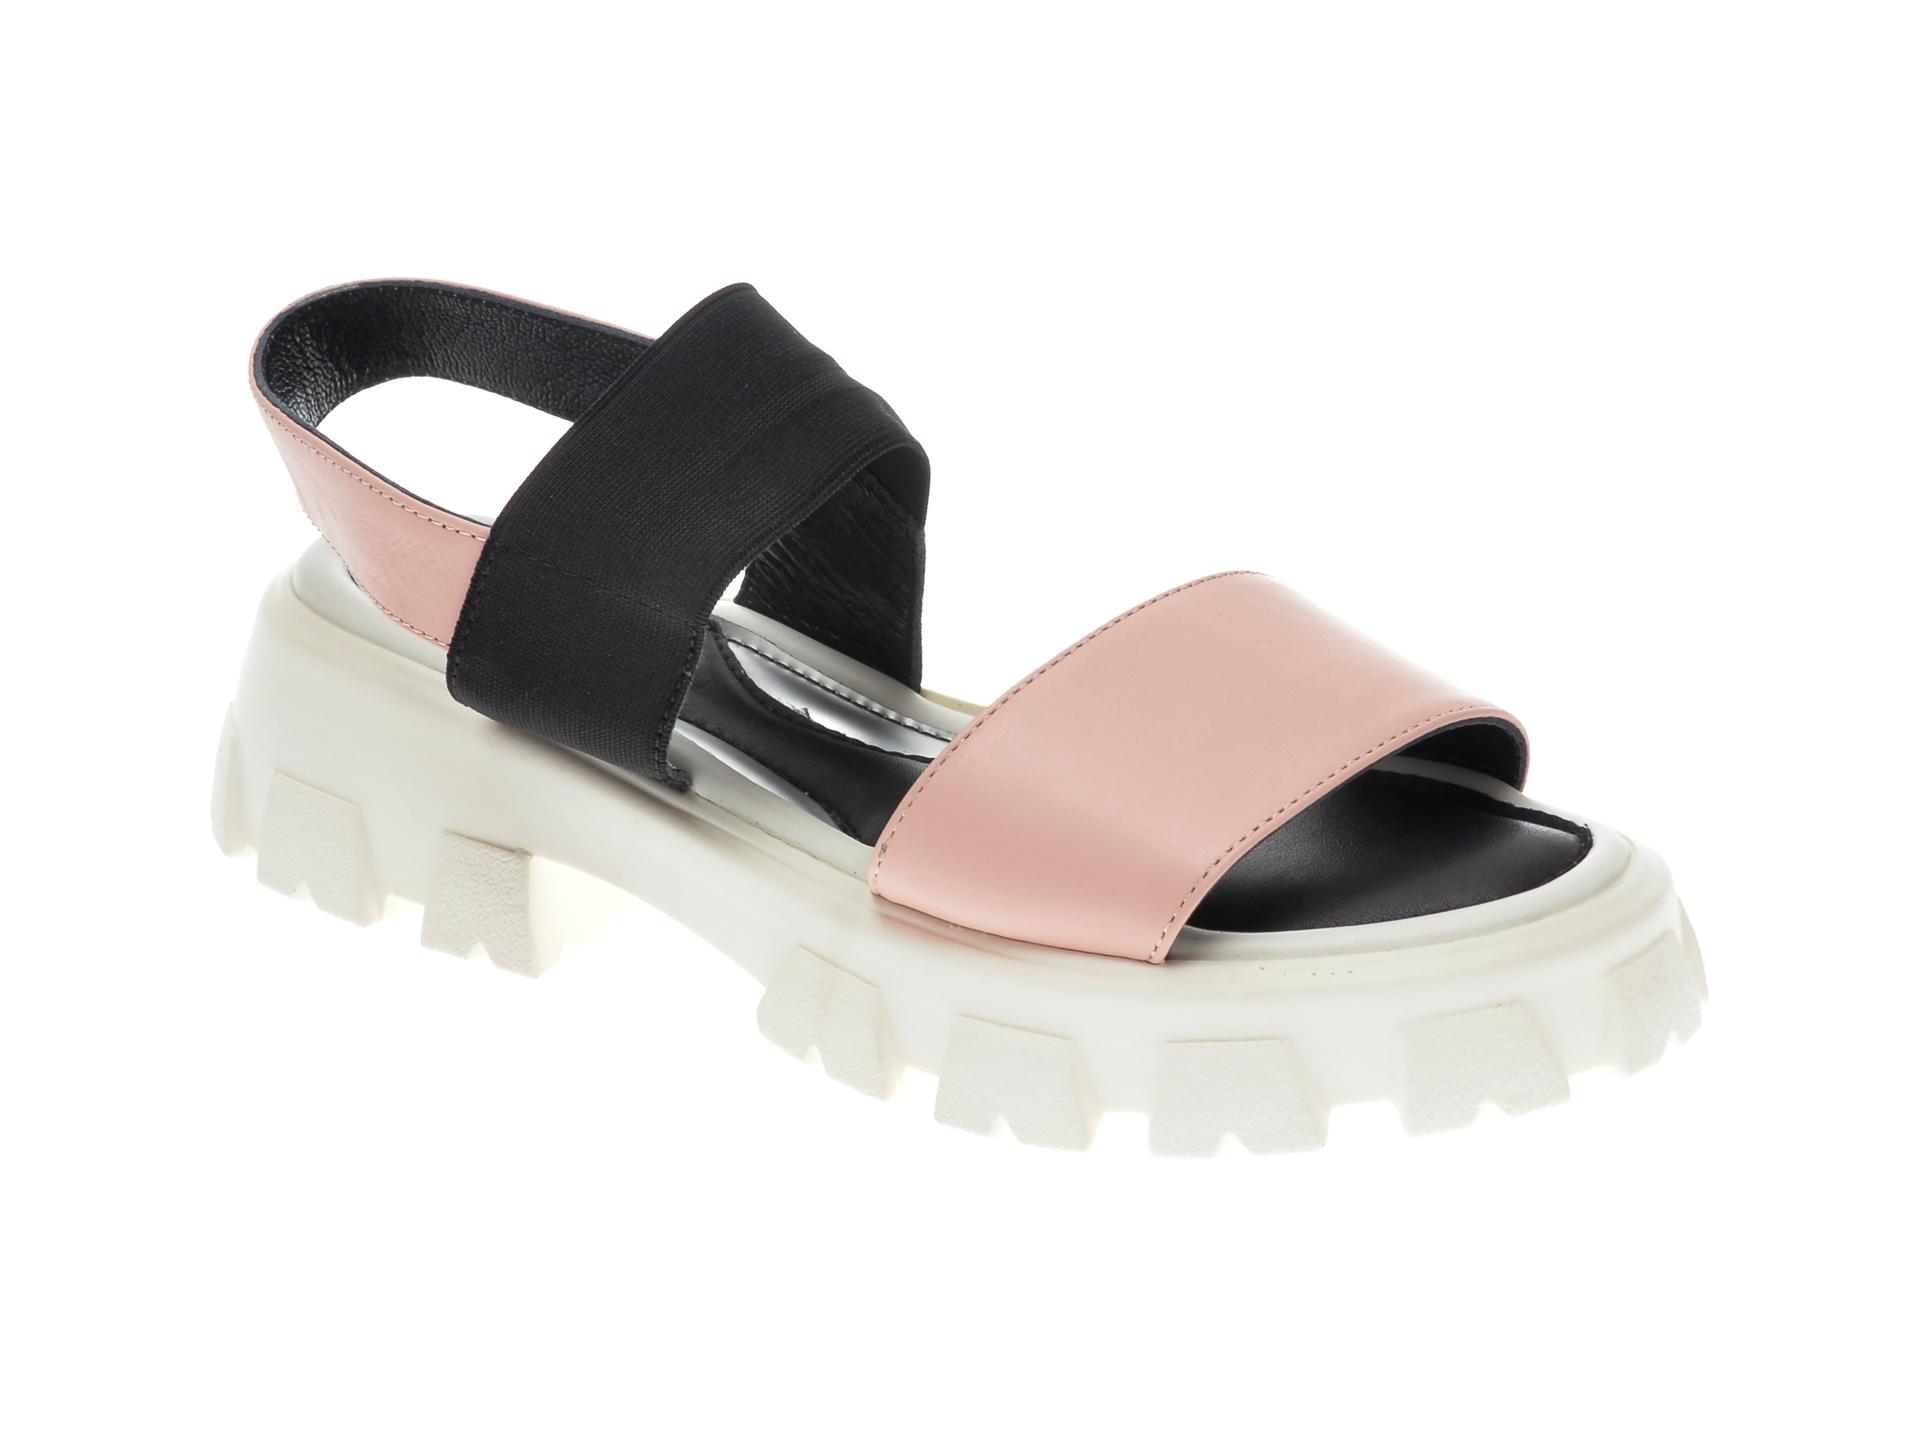 Sandale UNICA nude, 122, din piele naturala imagine otter.ro